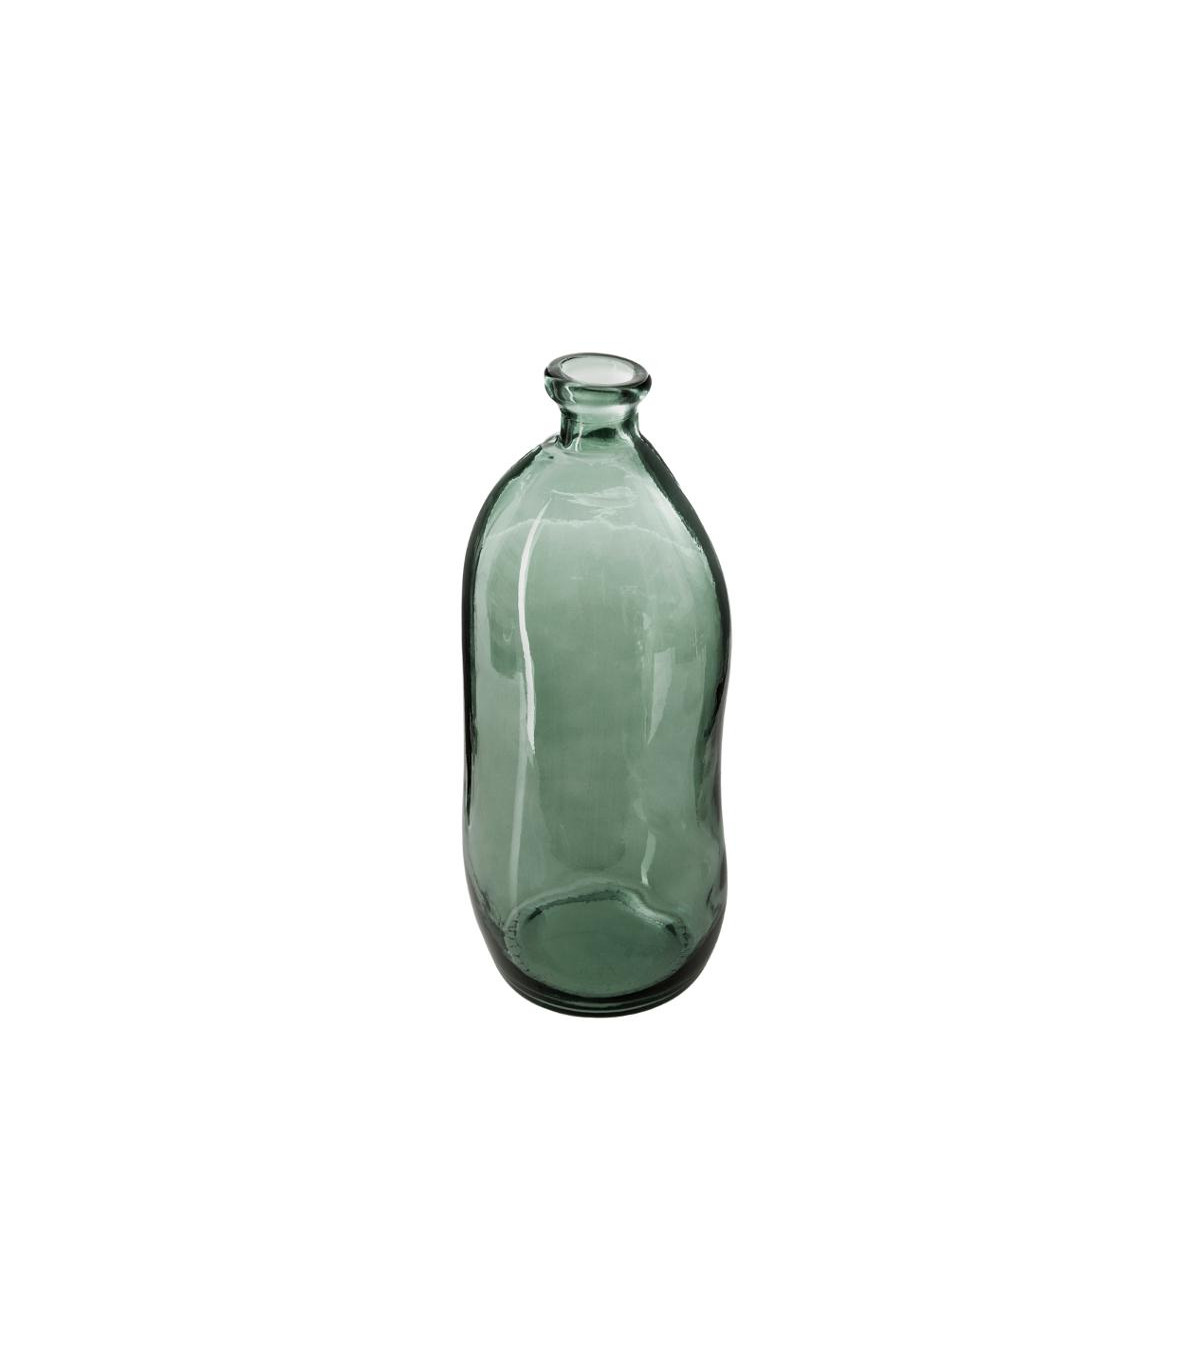 vase-bouteille-en-verre-recycle-vert-kaki-h-35-cm